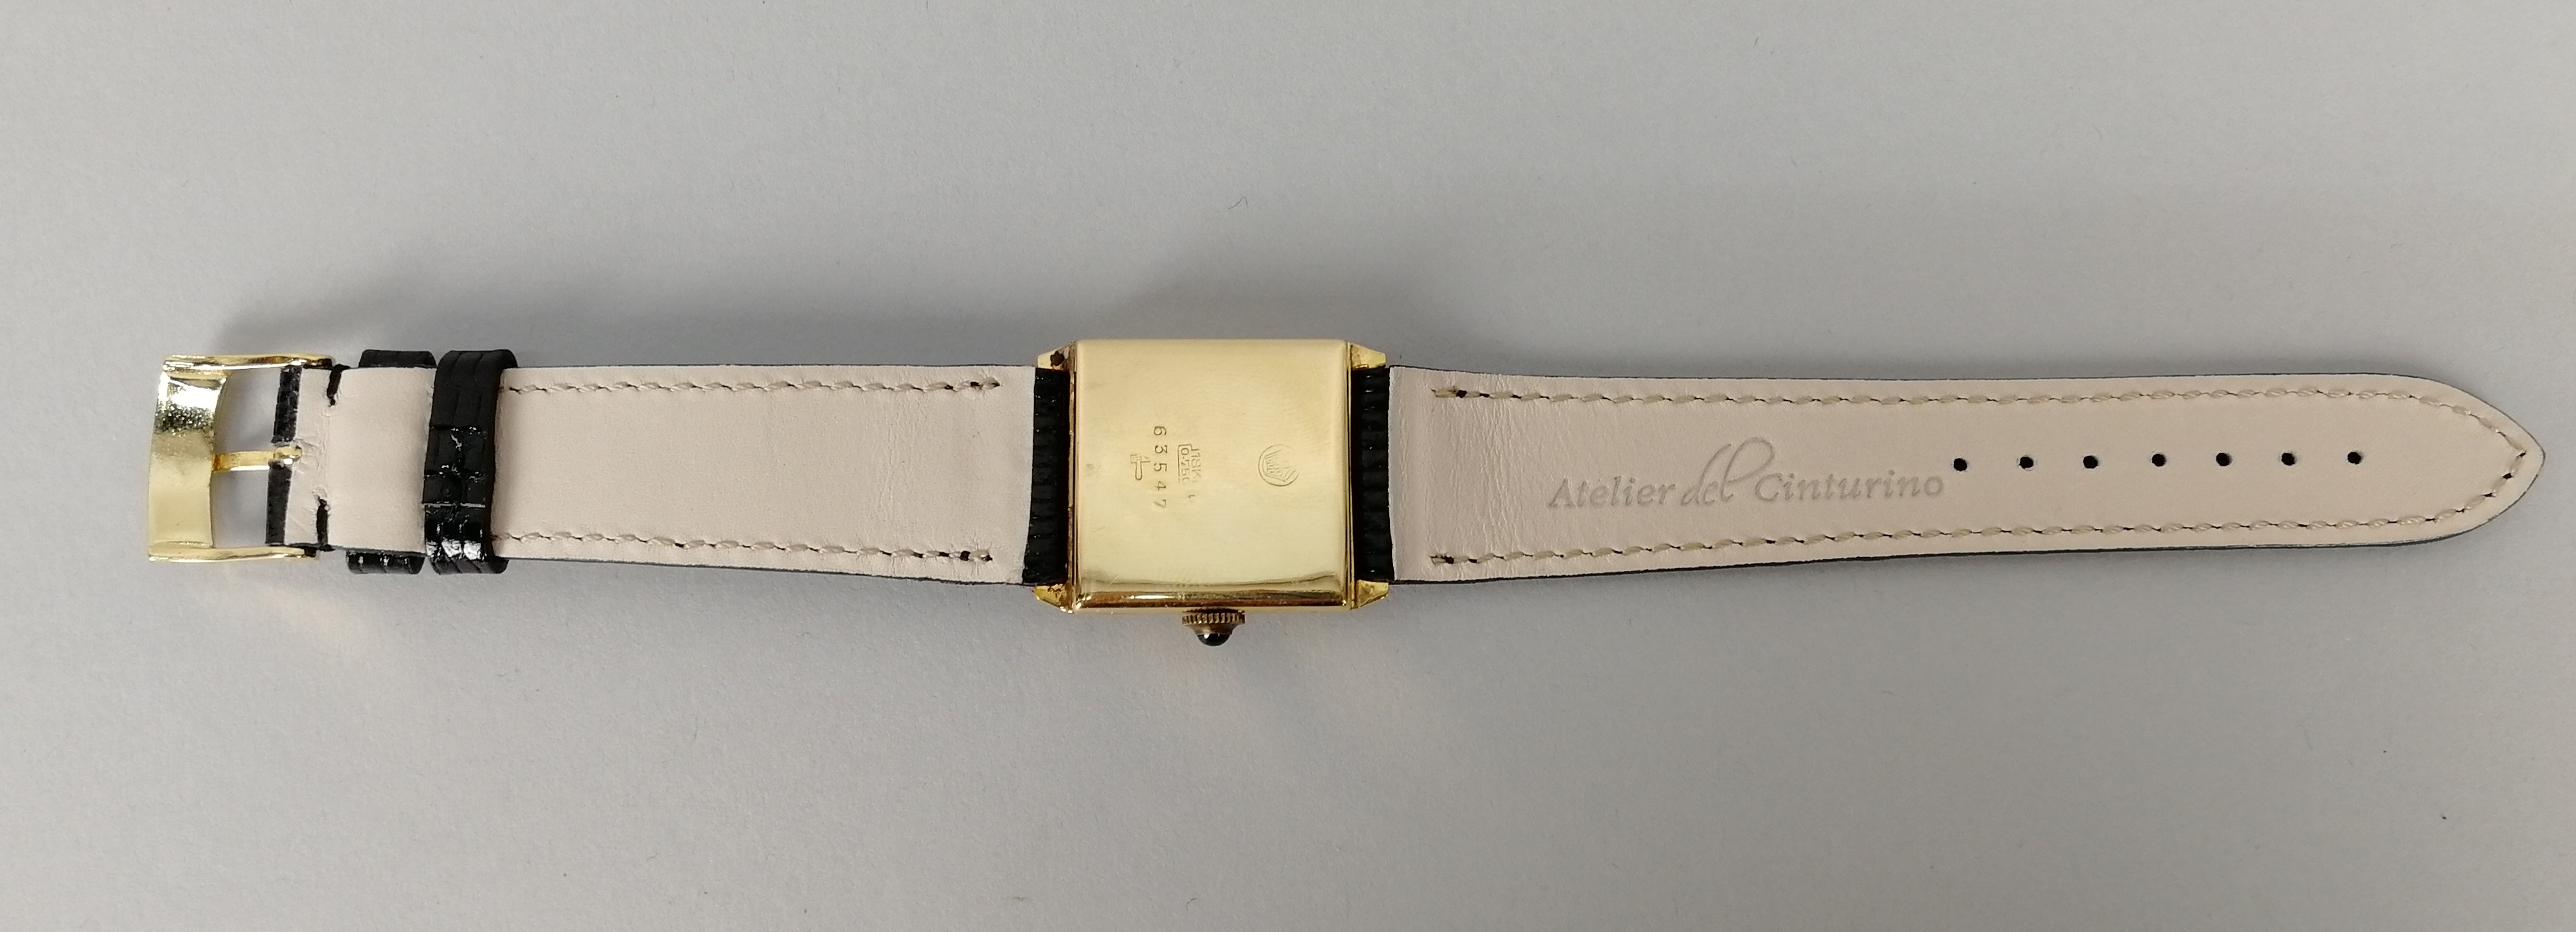 Lot 34 - NITEX. Orologio unisex in acciaio di forma quadrata. Quadrante originale. Epoca 1950. Funzionante